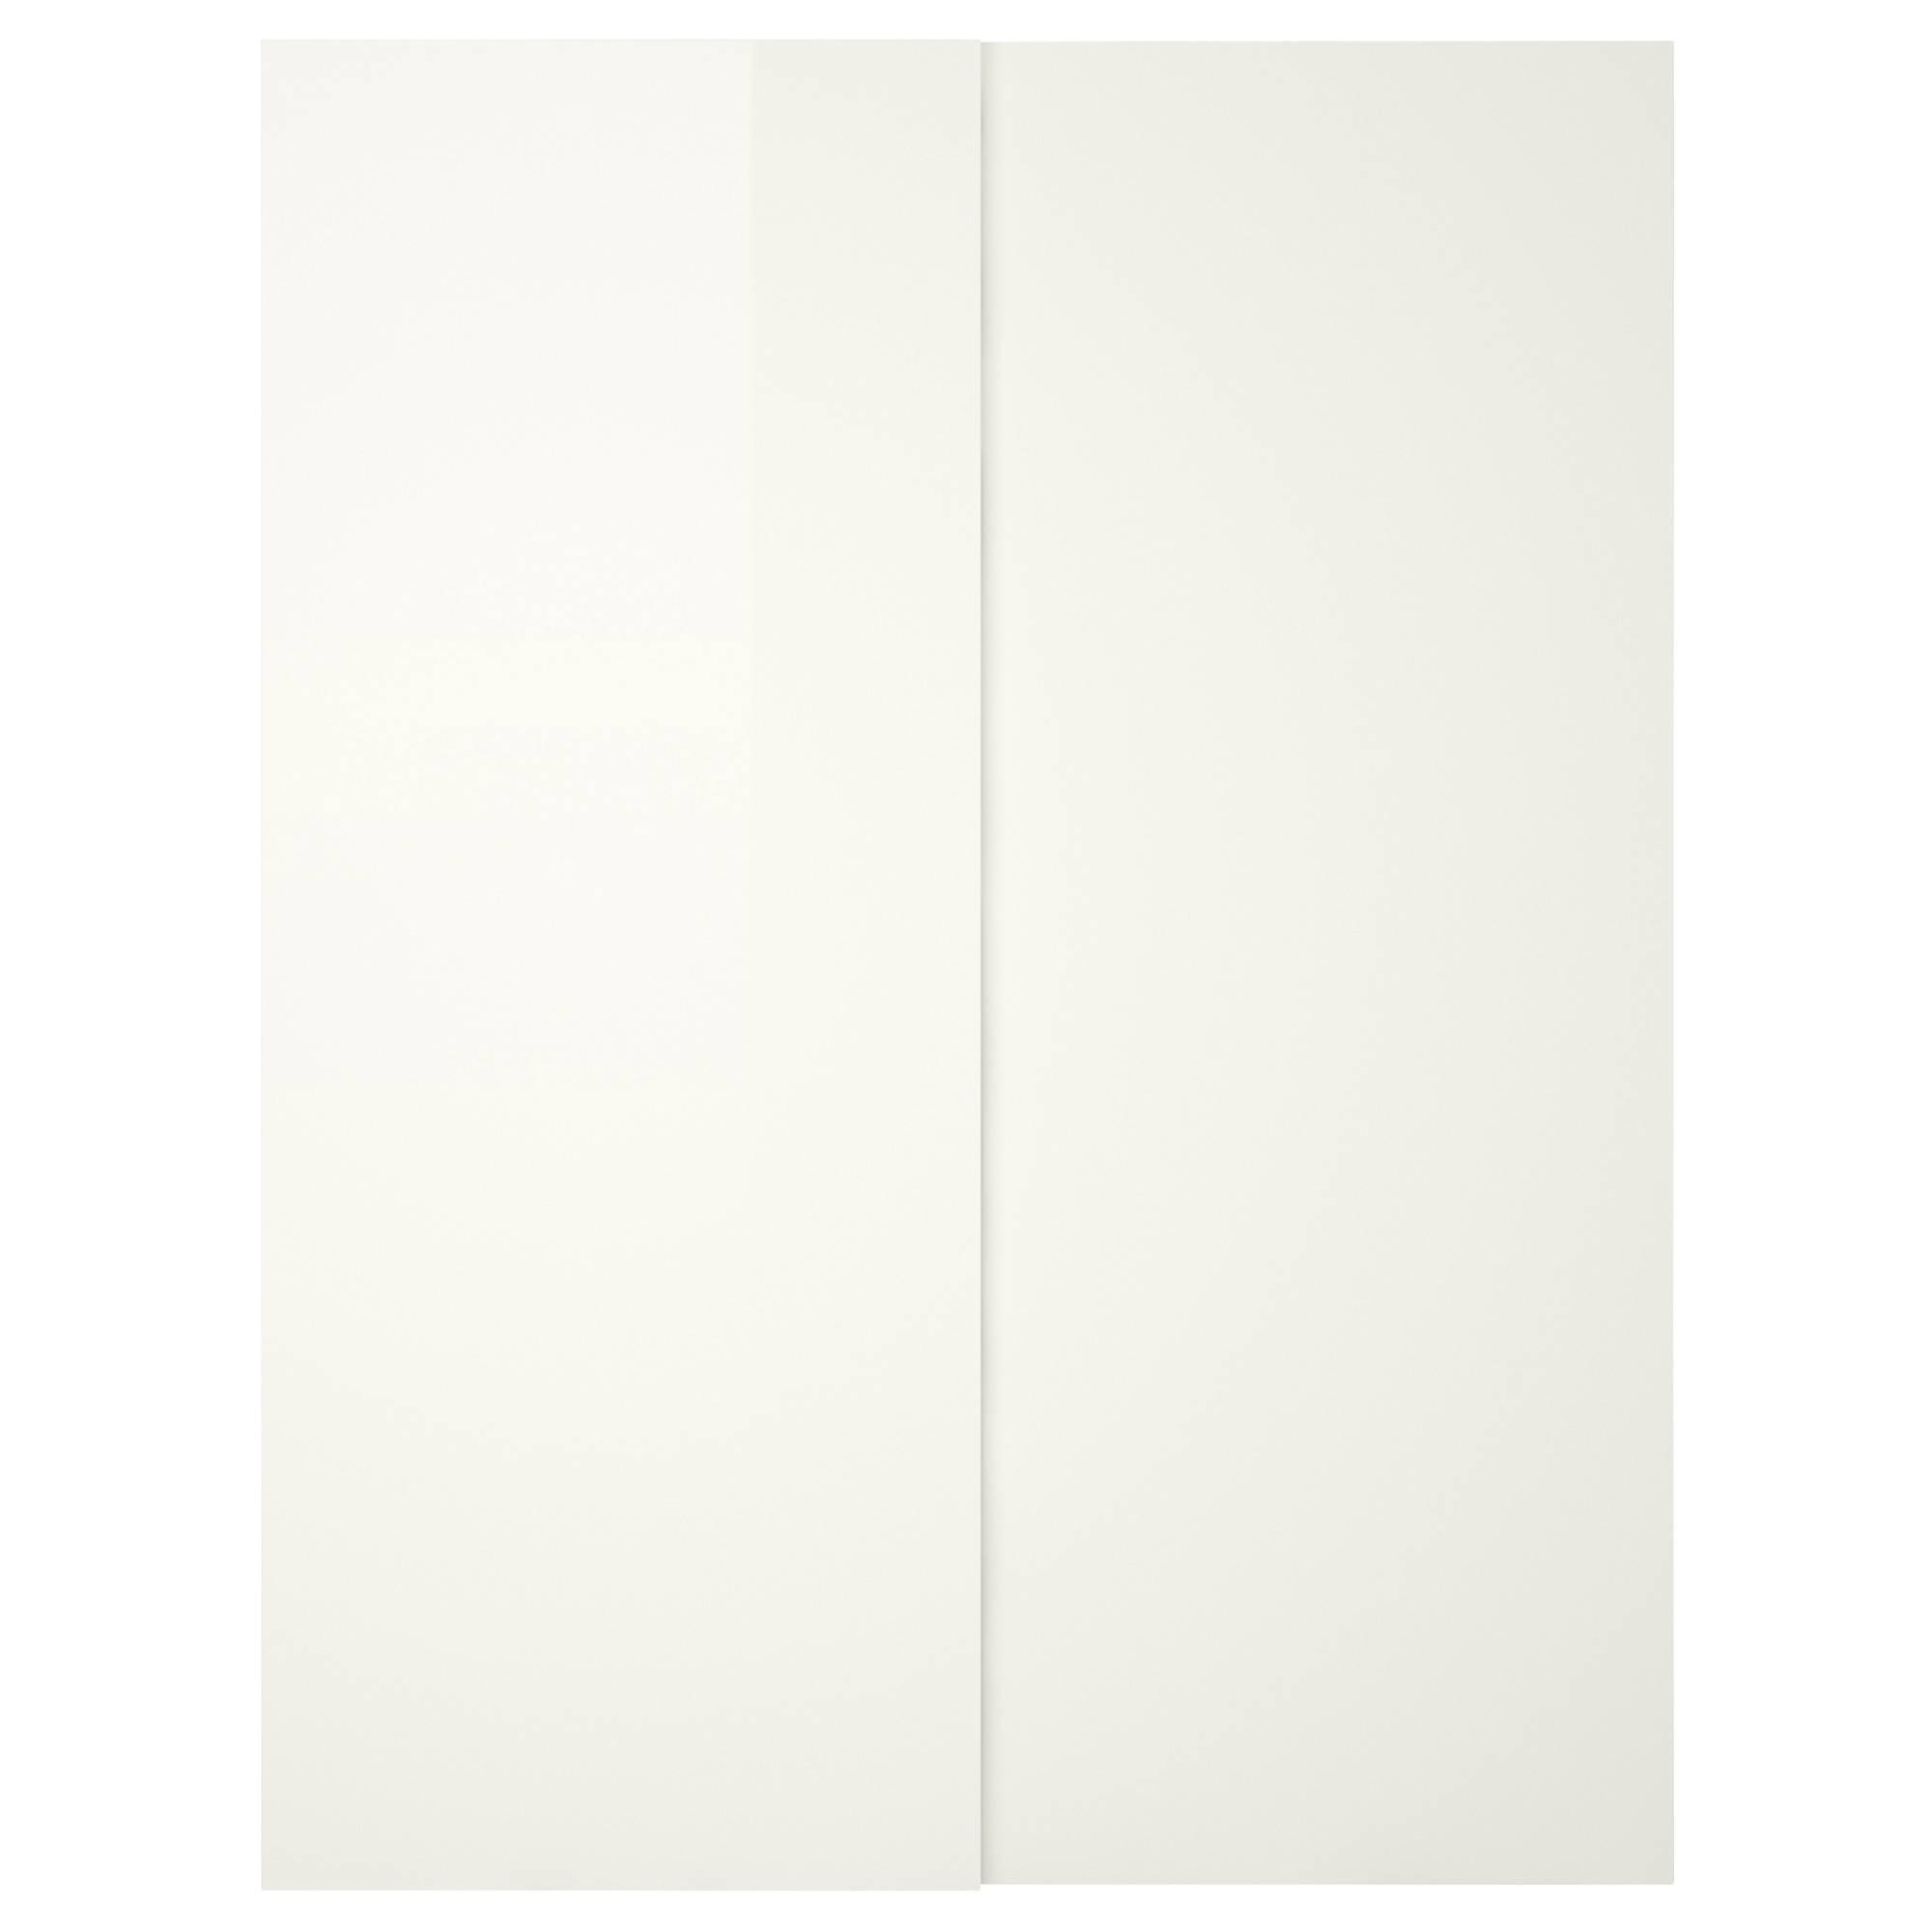 Hasvik Pair Of Sliding Doors High-Gloss/white 150X201 Cm - Ikea within White Gloss Sliding Wardrobes (Image 3 of 15)